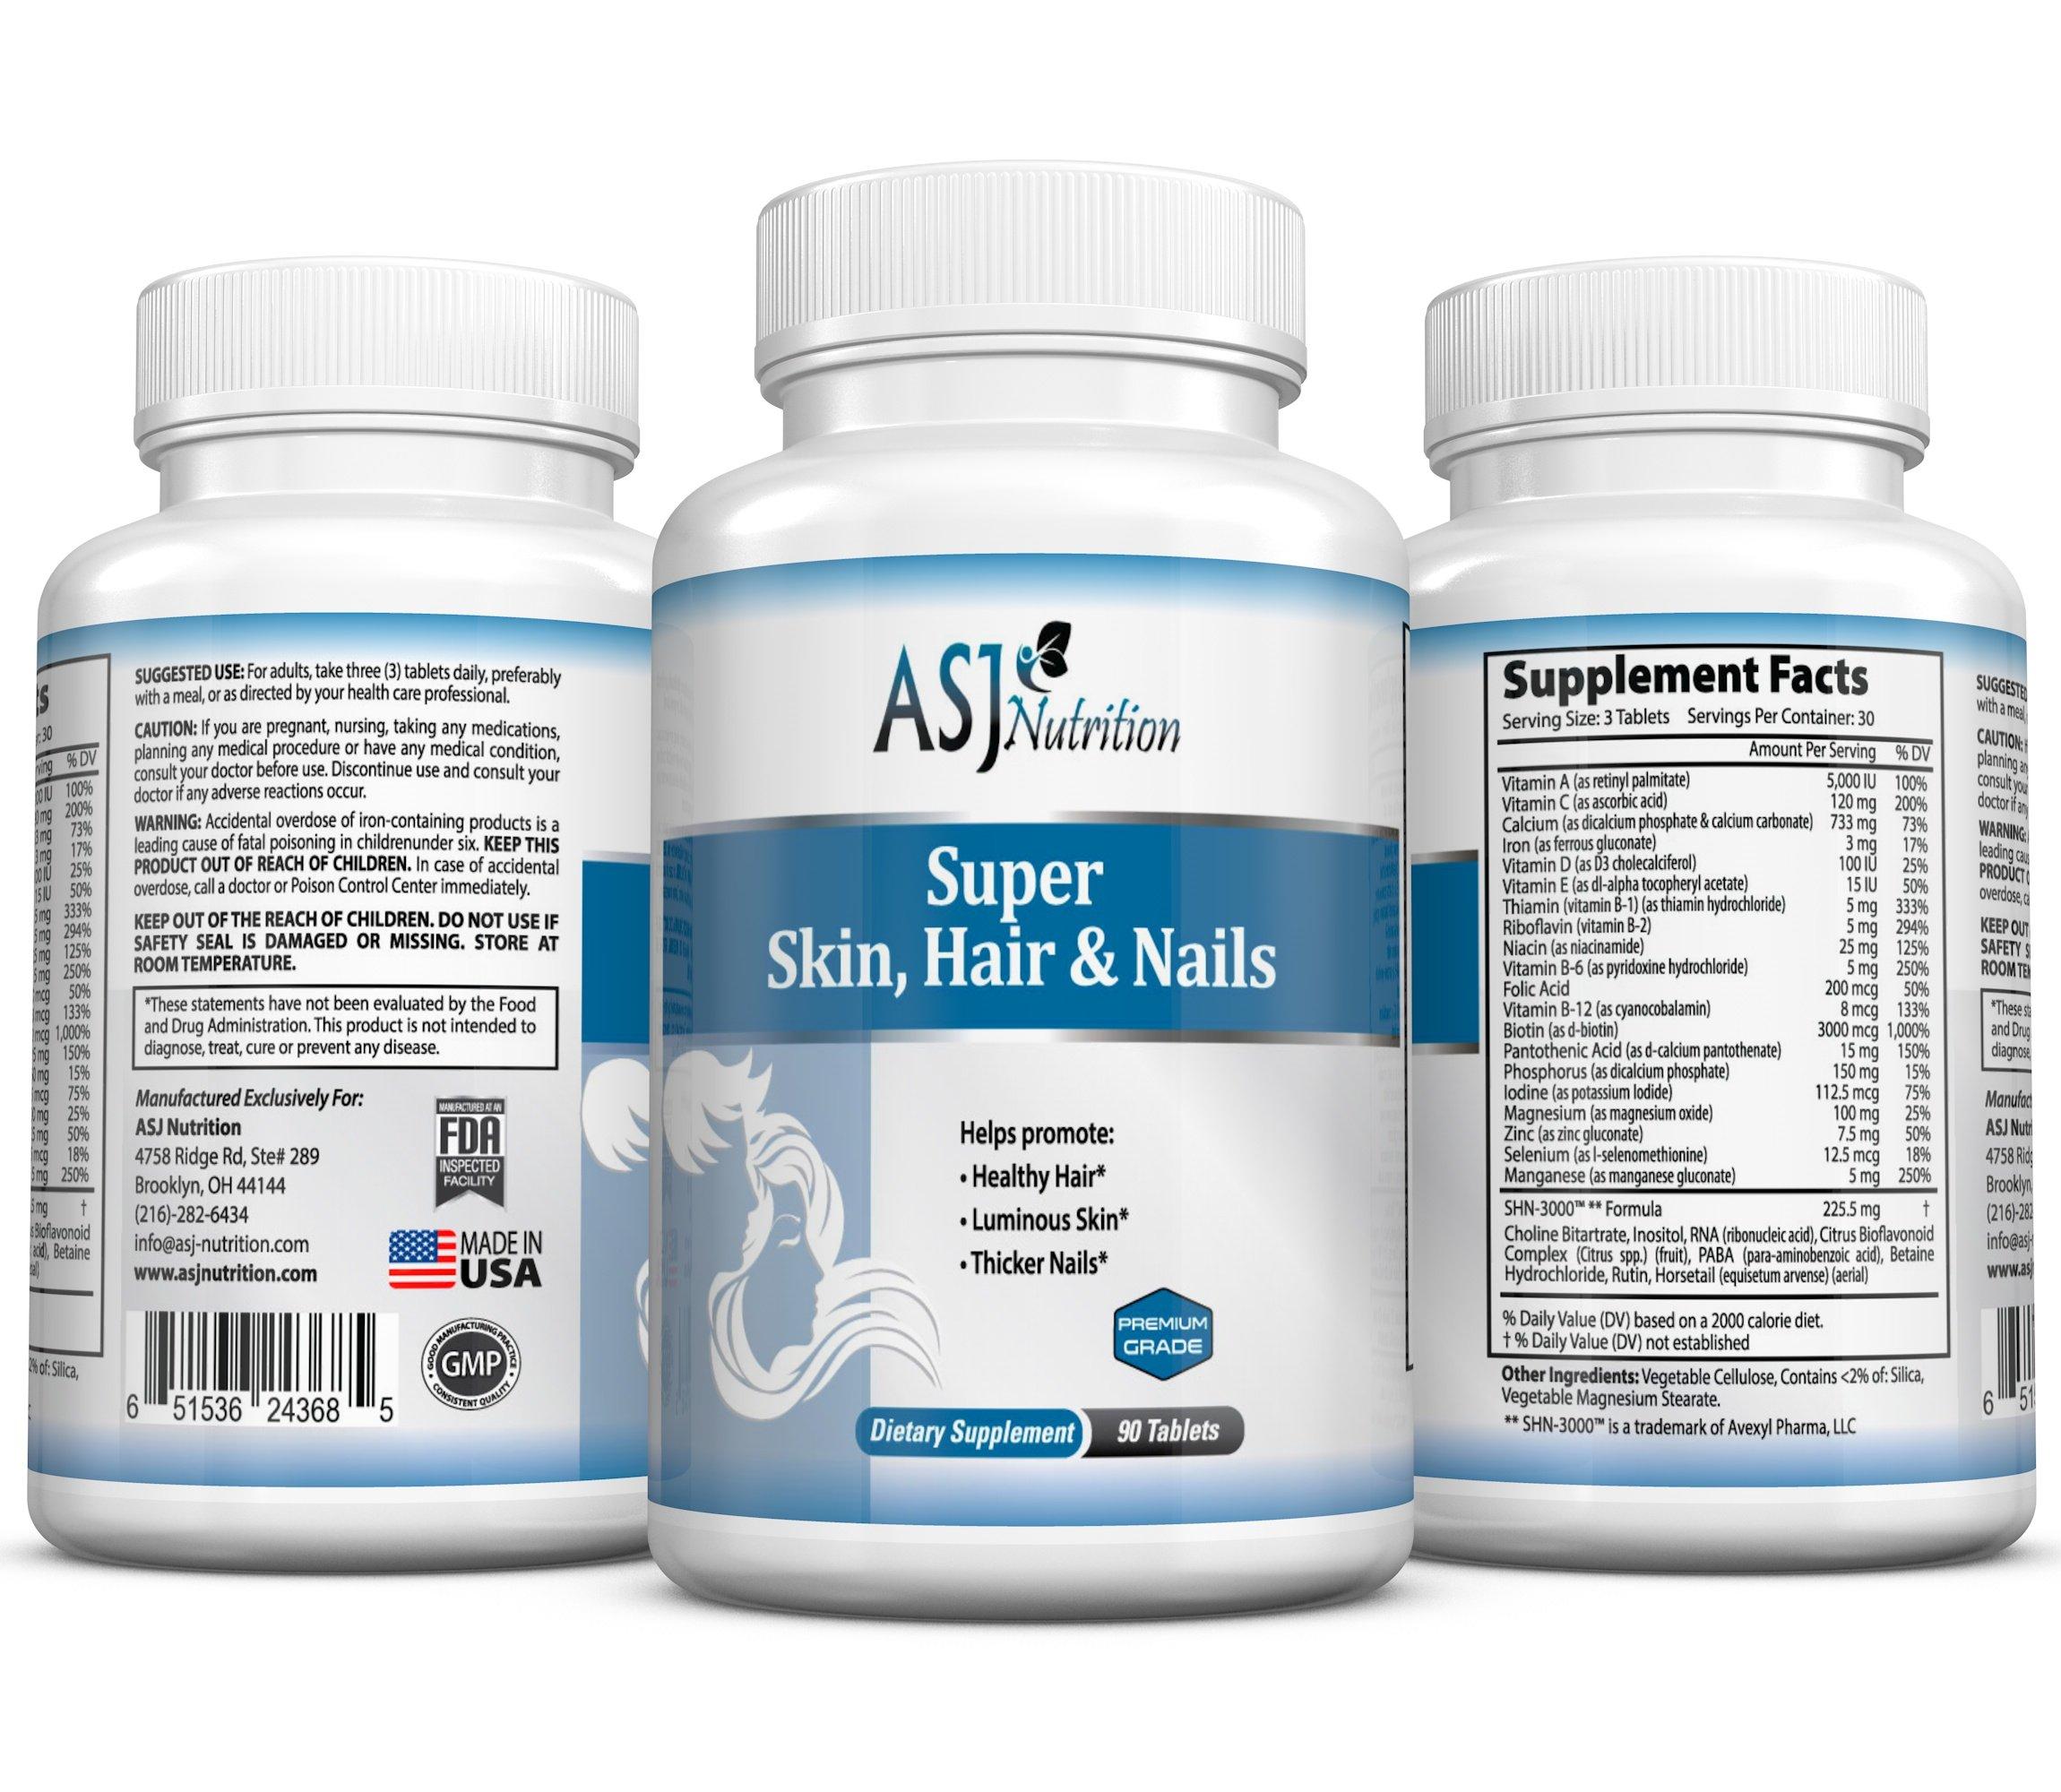 Spill Super (capsules): reviews 35